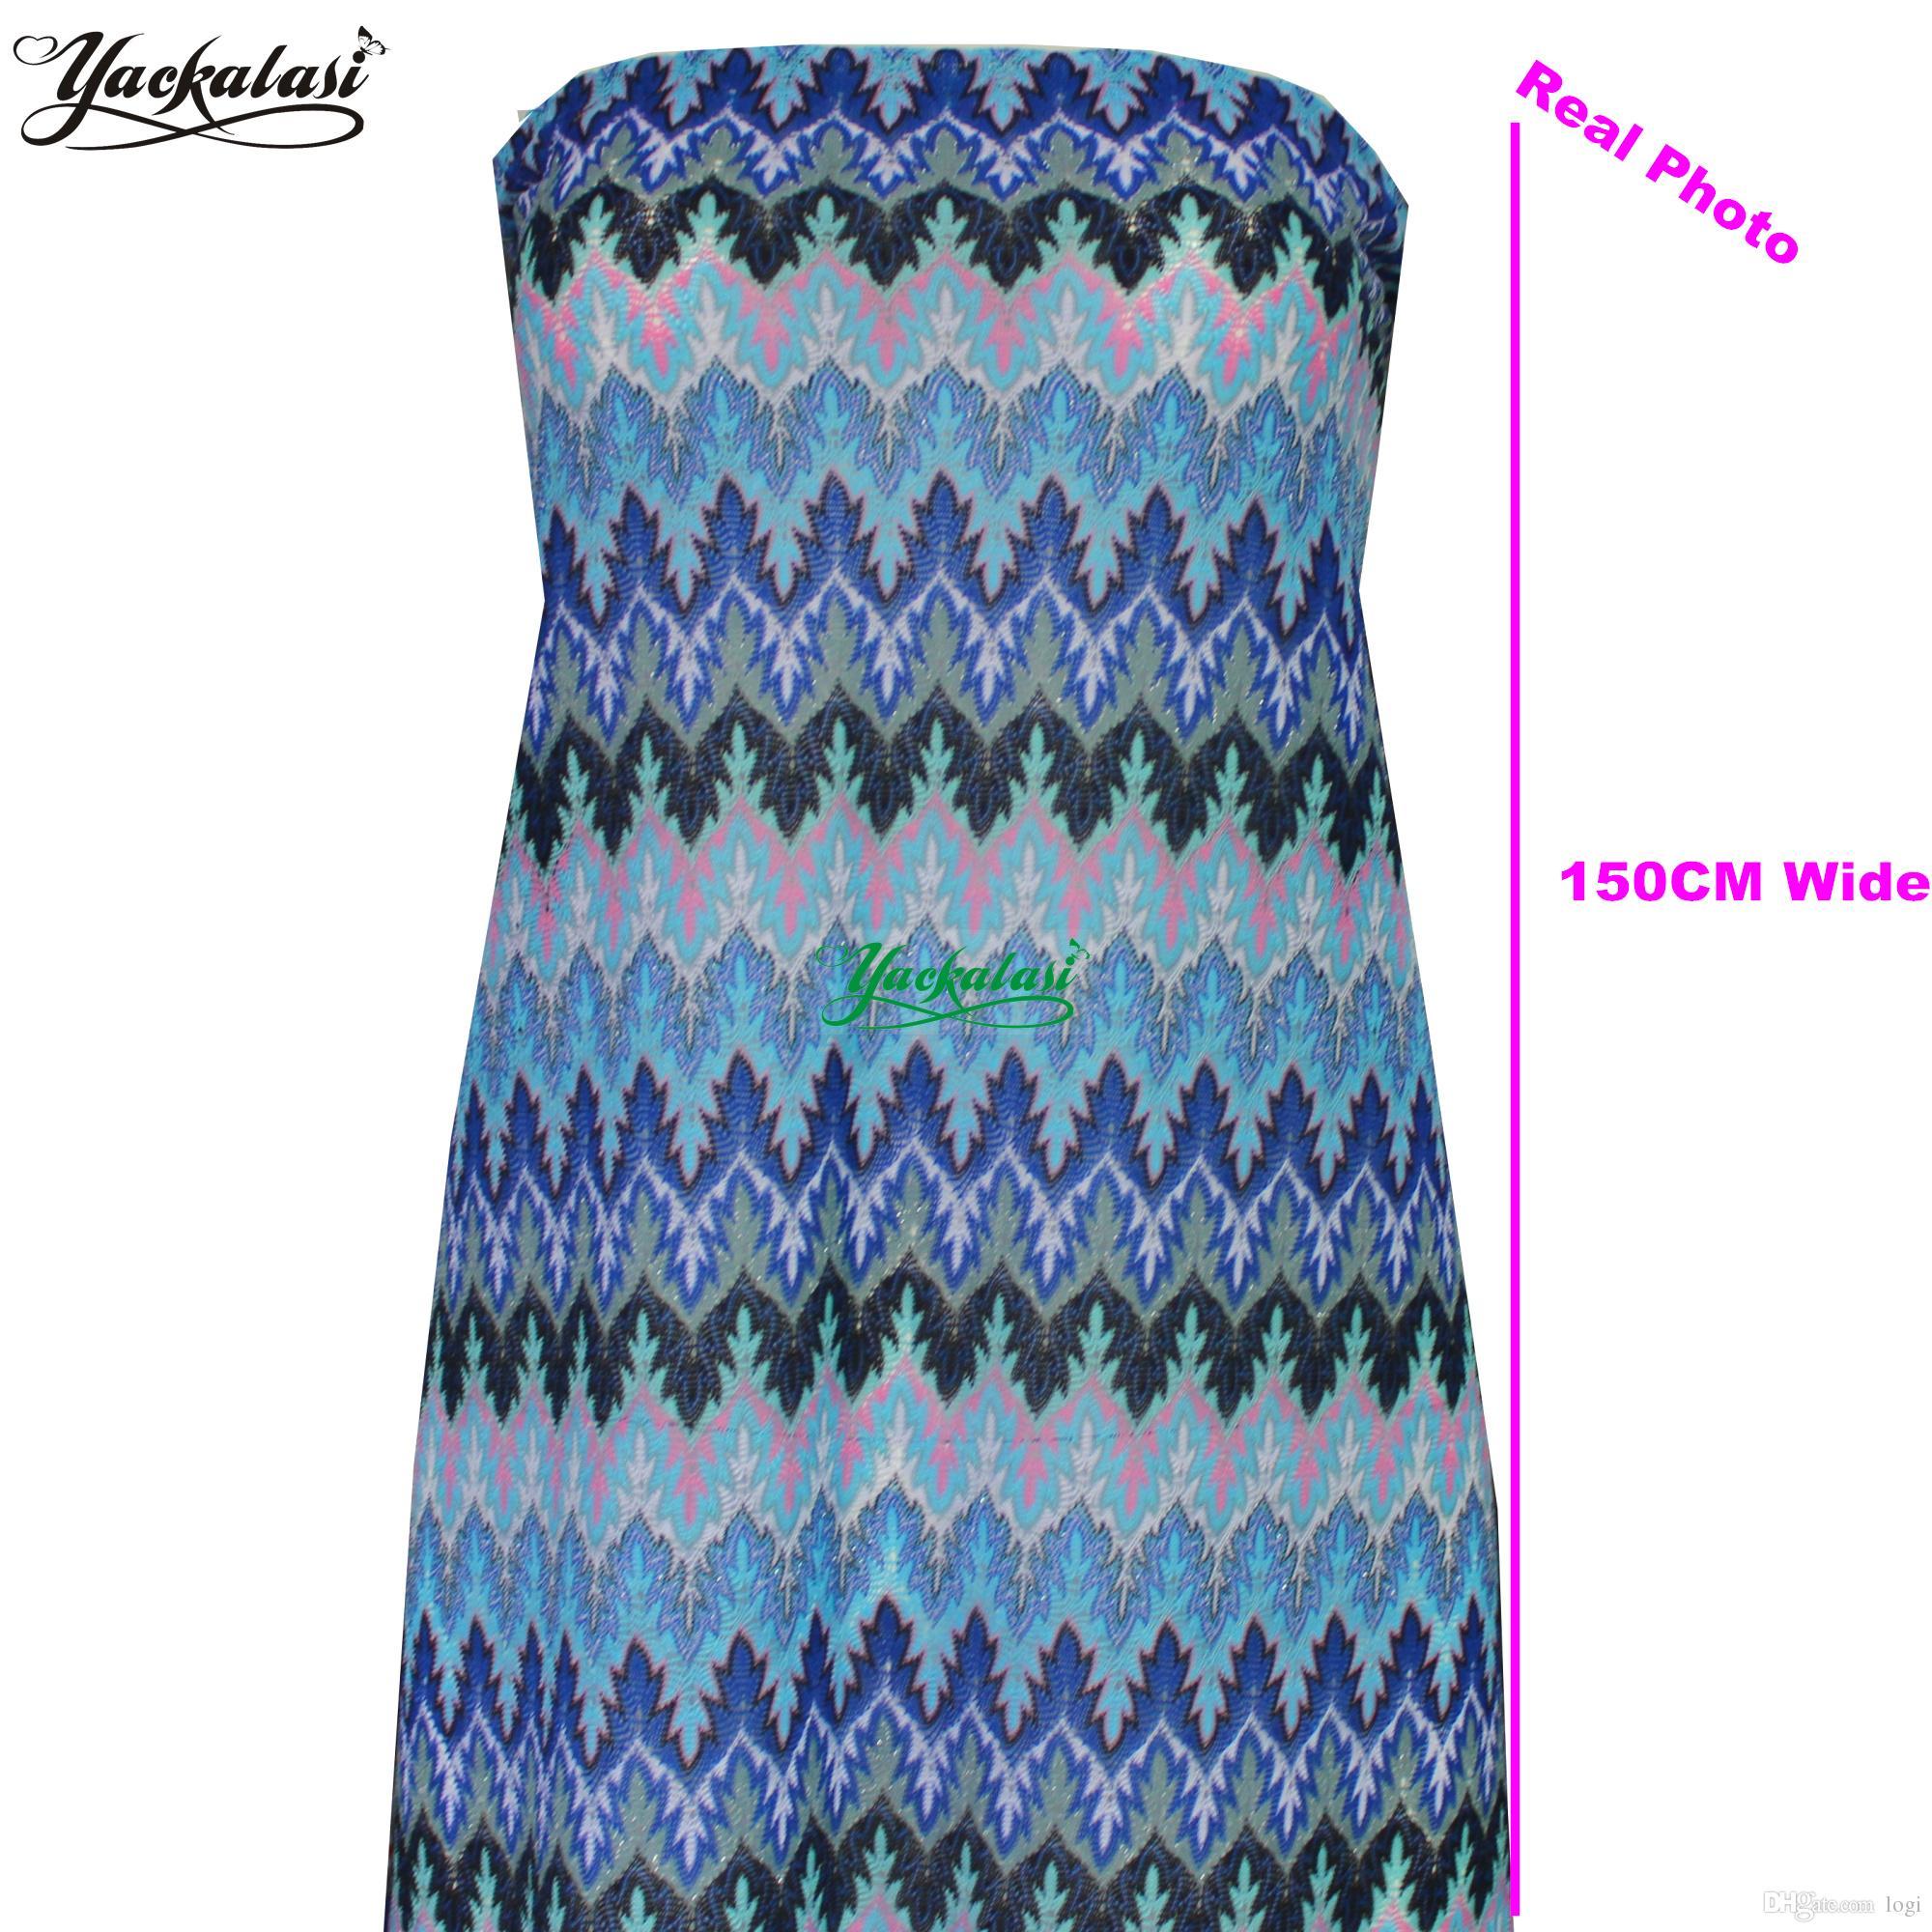 newest bbc91 77c86 YACKALASI 5 Yards / Lot Missoni Knitting Merletto Tessuti Wave Strip  Crochet Tessuto a rete Fai da te Moda panno Maple Leaf 155CM Wide